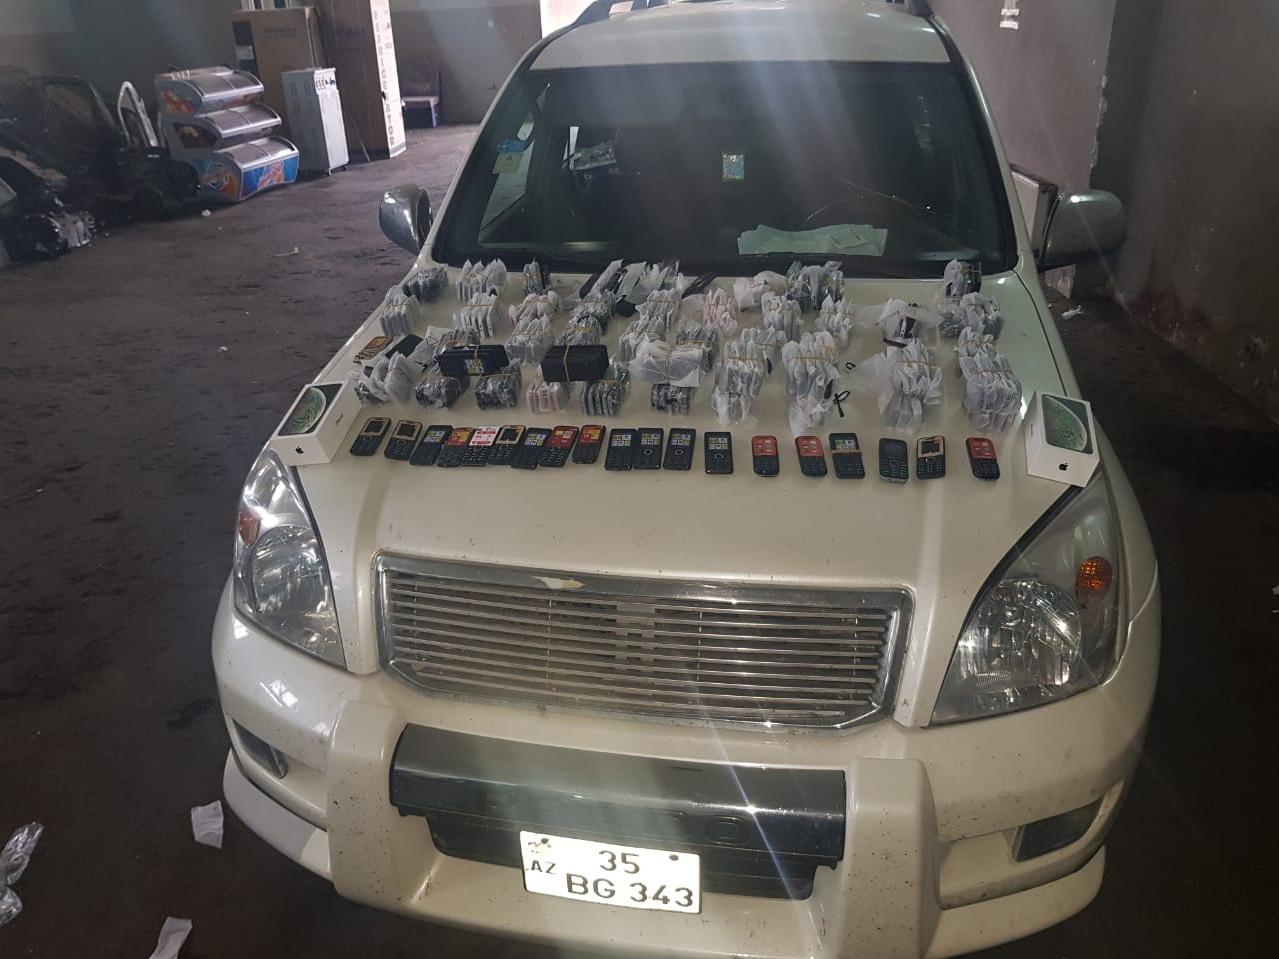 На таможне в автомобиле обнаружено 240 телефонов - ВИДЕО - ФОТО